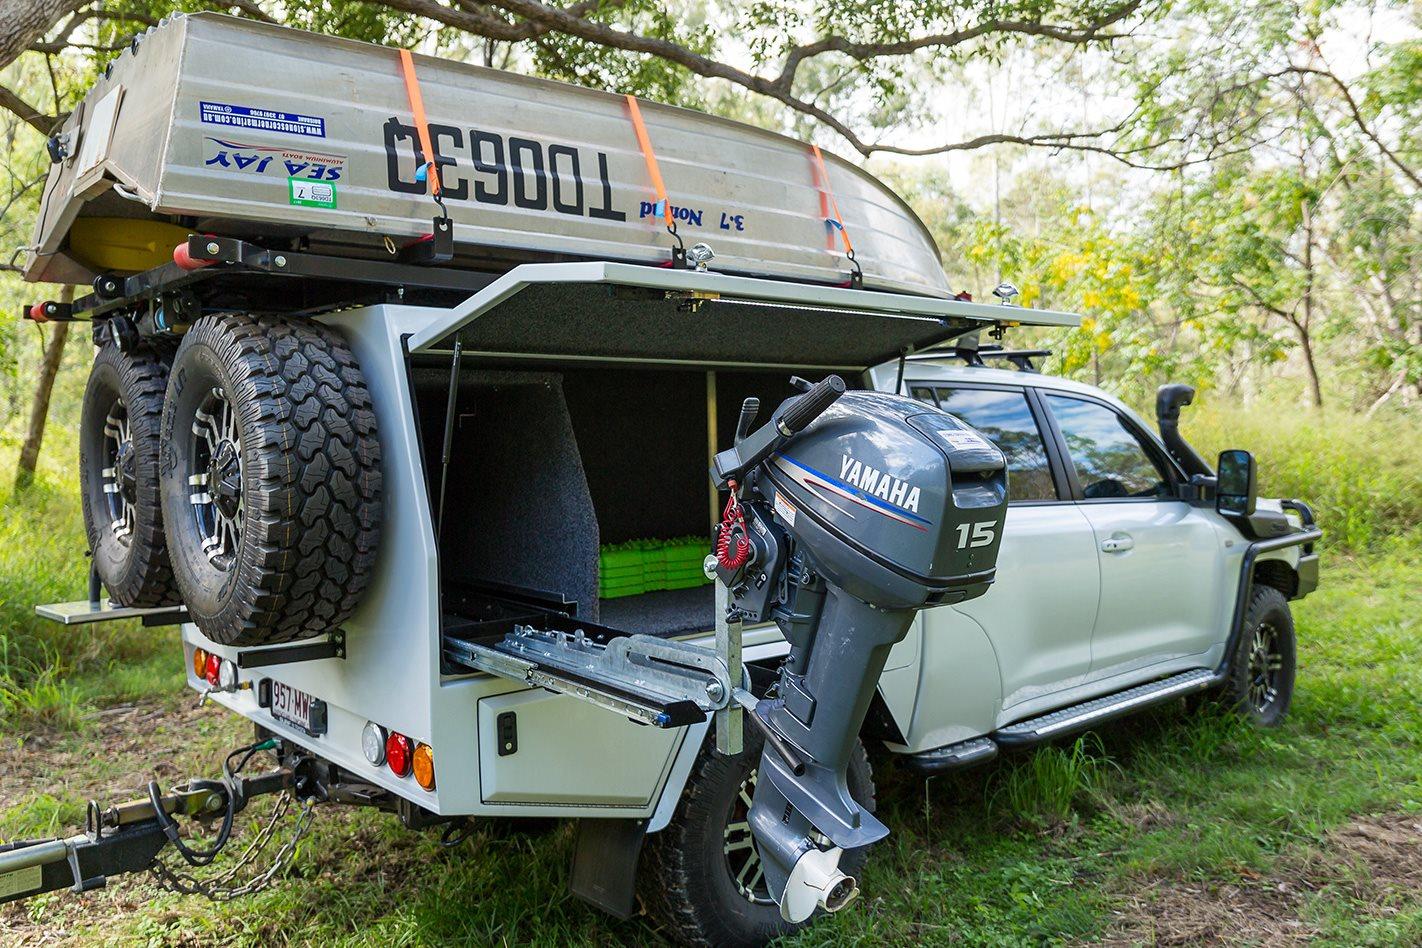 Custom Land Cruiser 200 Series Tray setups